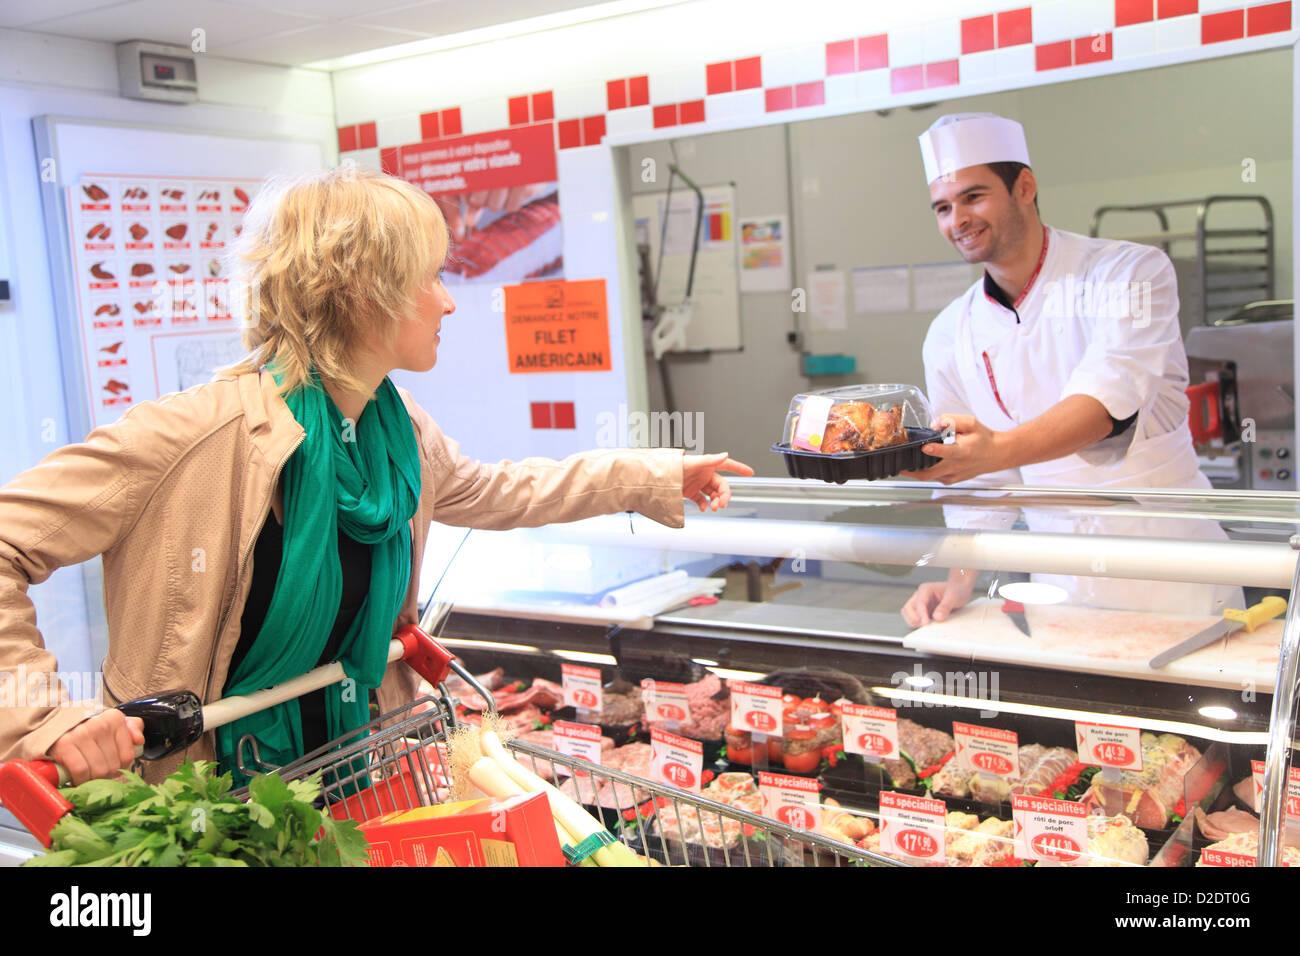 France, supermarket, customer. - Stock Image